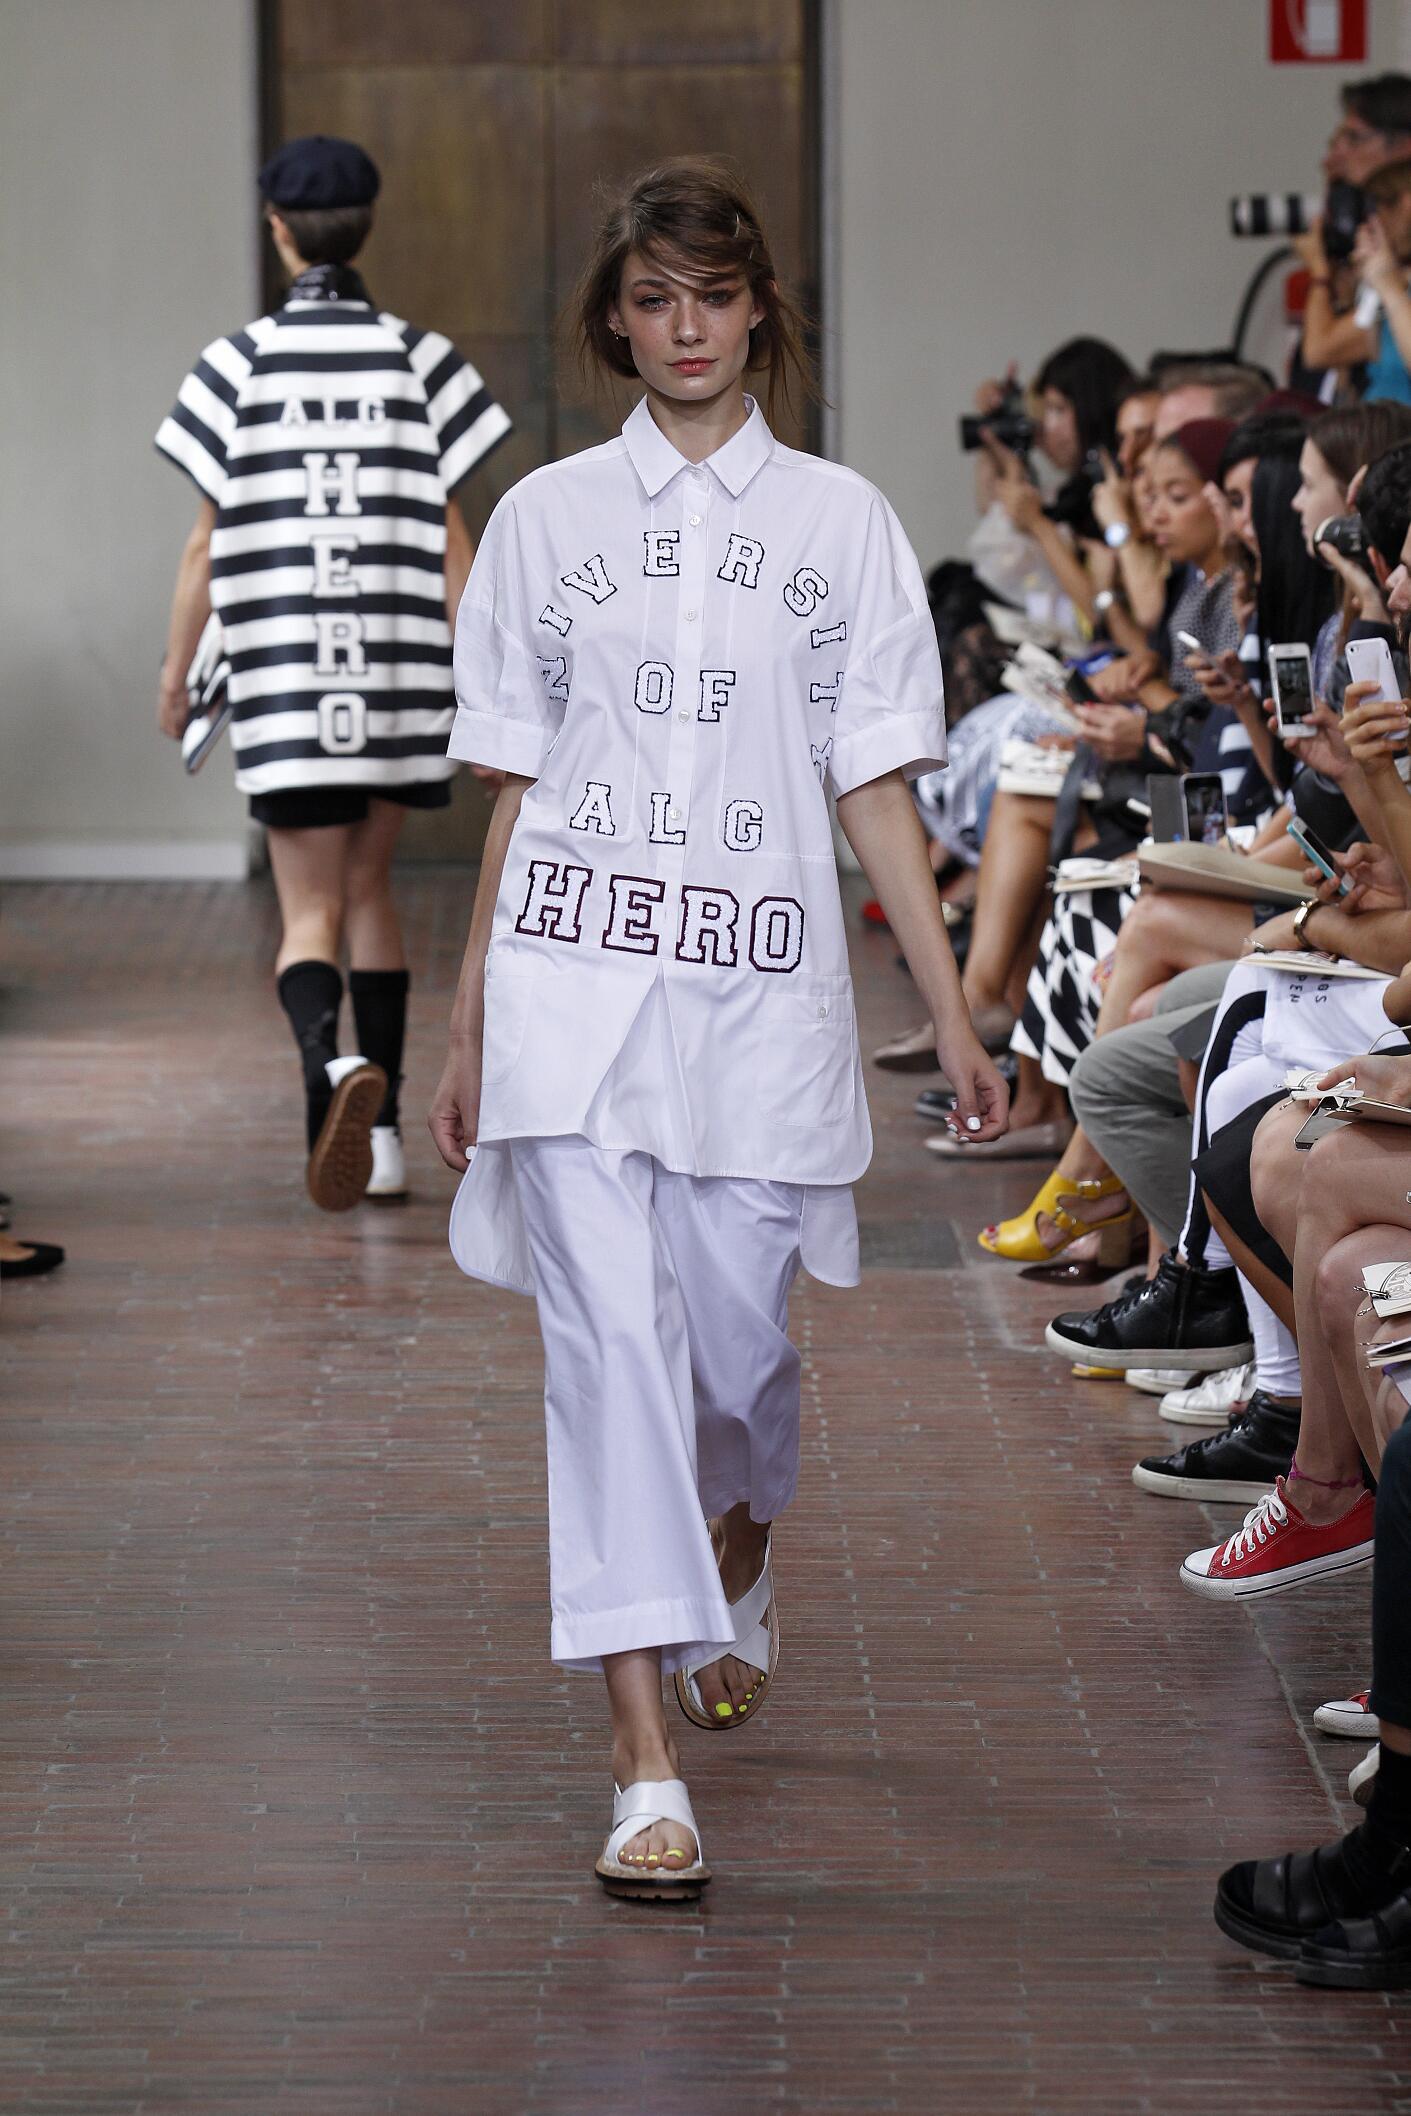 Spring Summer 2015 Fashion Model I'm Isola Marras